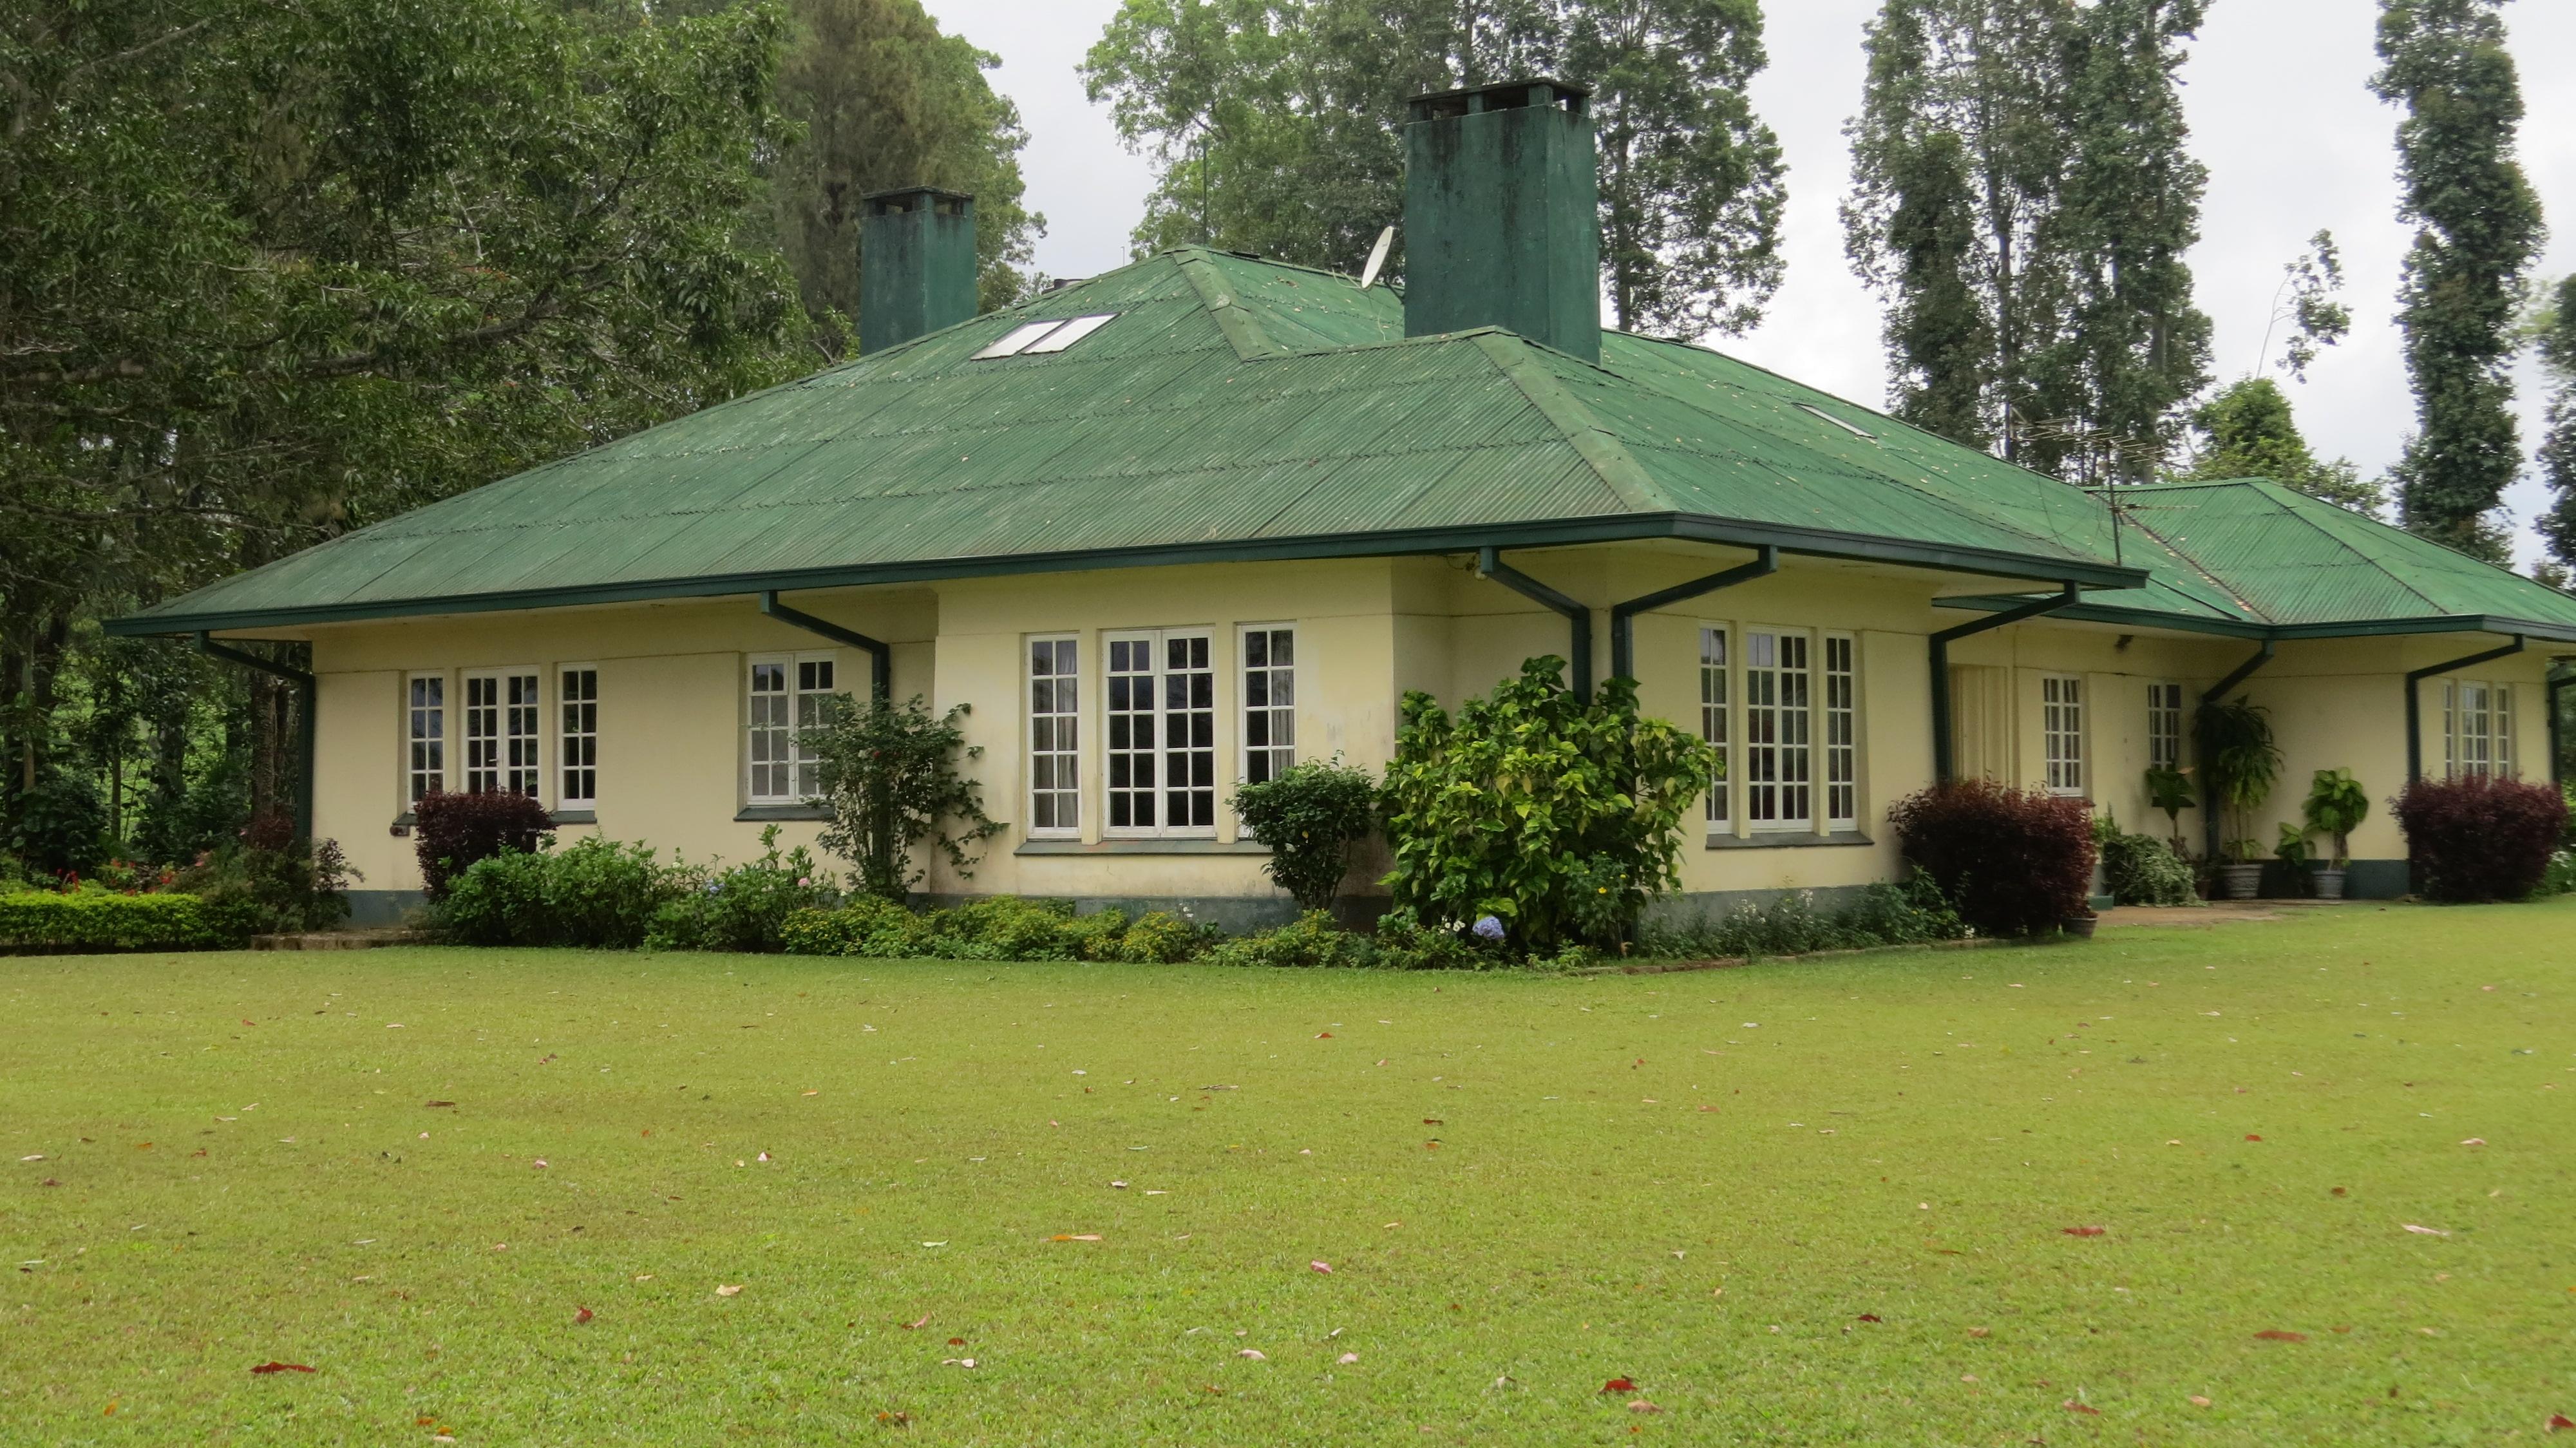 Bungalows, Bungalow floor plans and Sri lanka on Pinterest